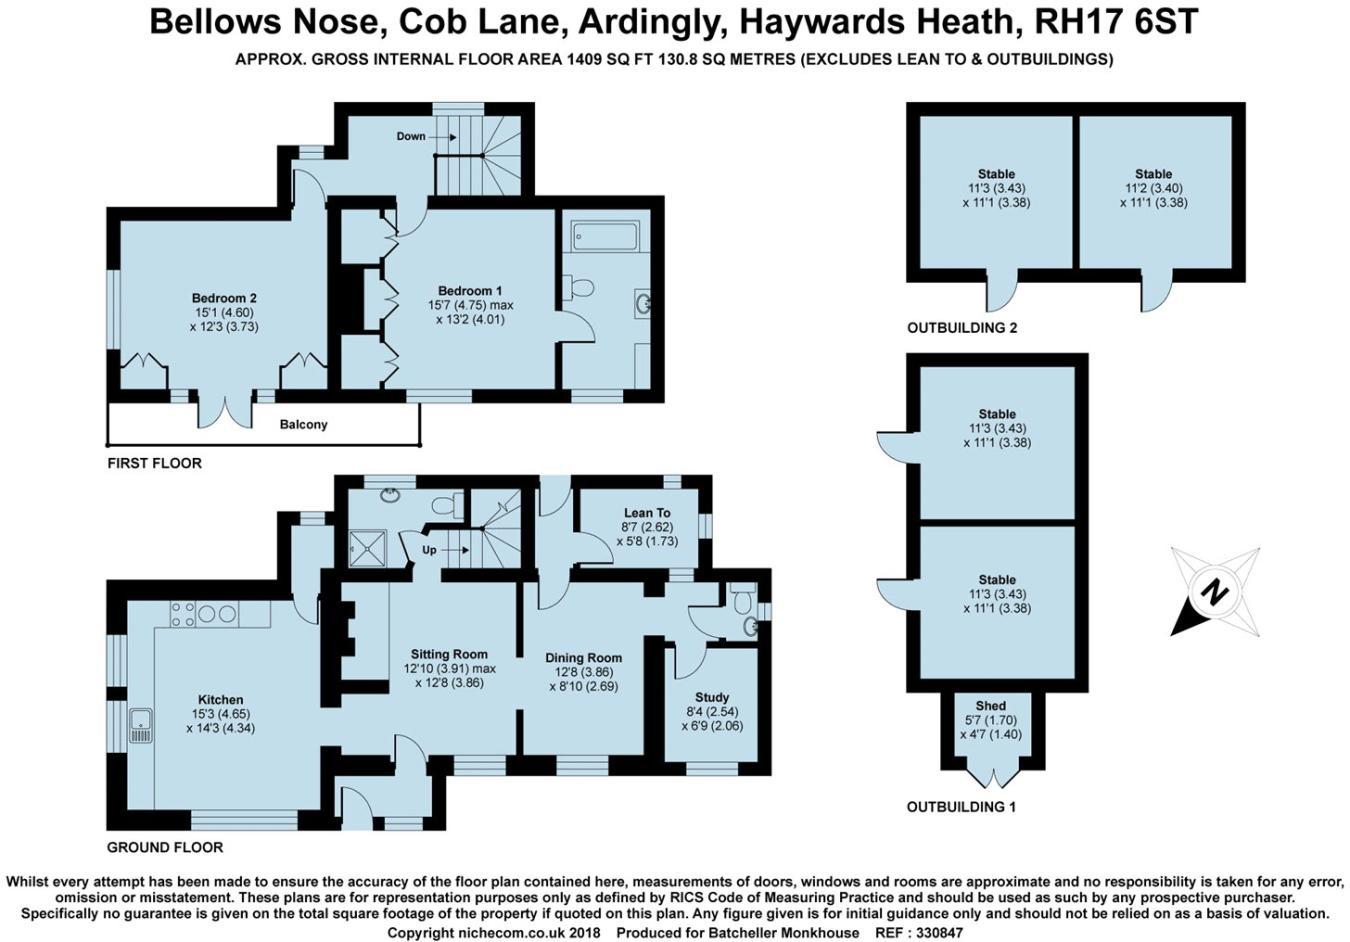 2 bedroom detached house for sale in Cob Lane, Ardingly, RH17